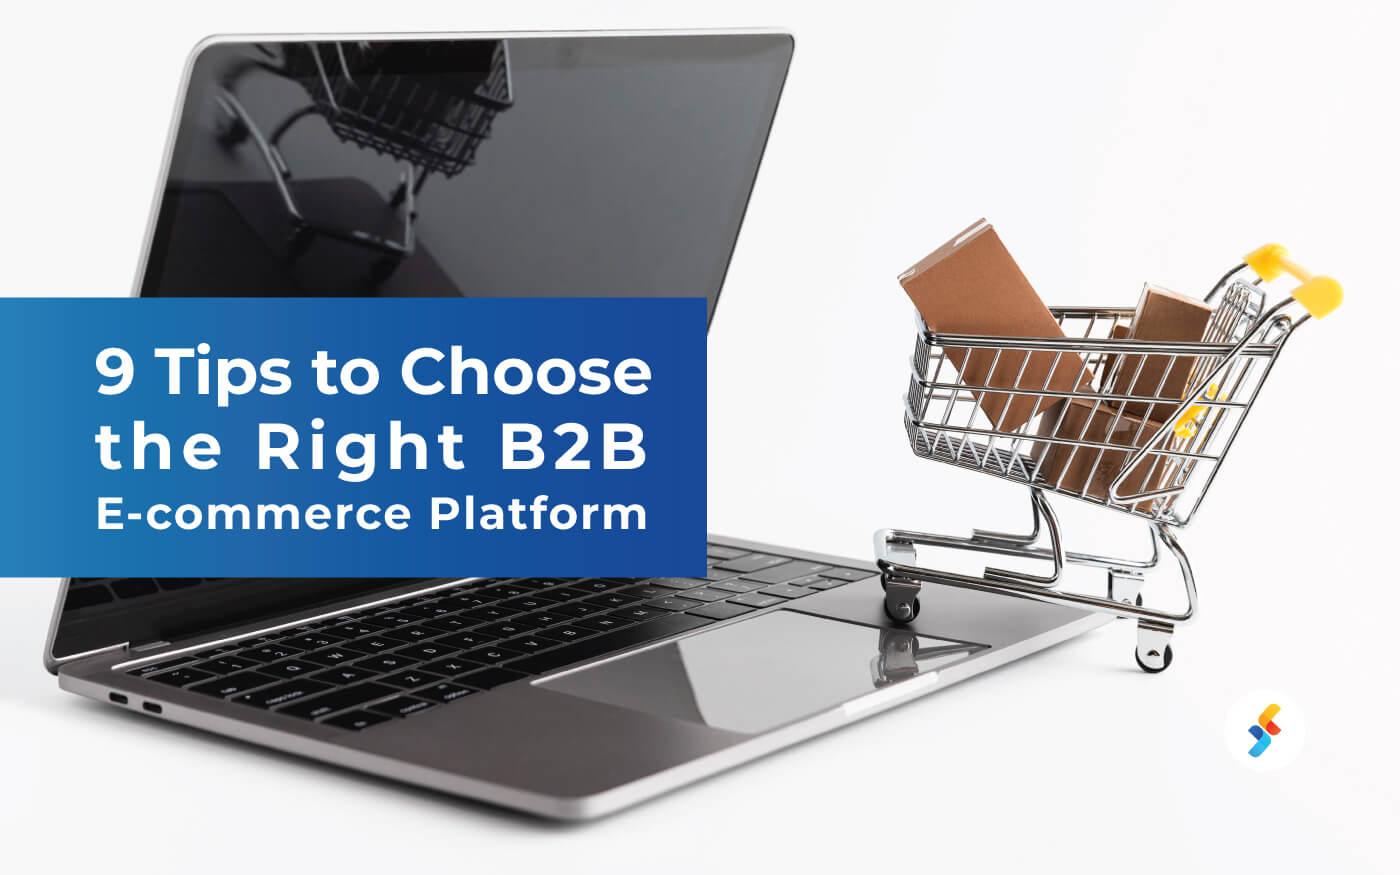 9 Tips to Choose the Right B2B E-commerce Platform